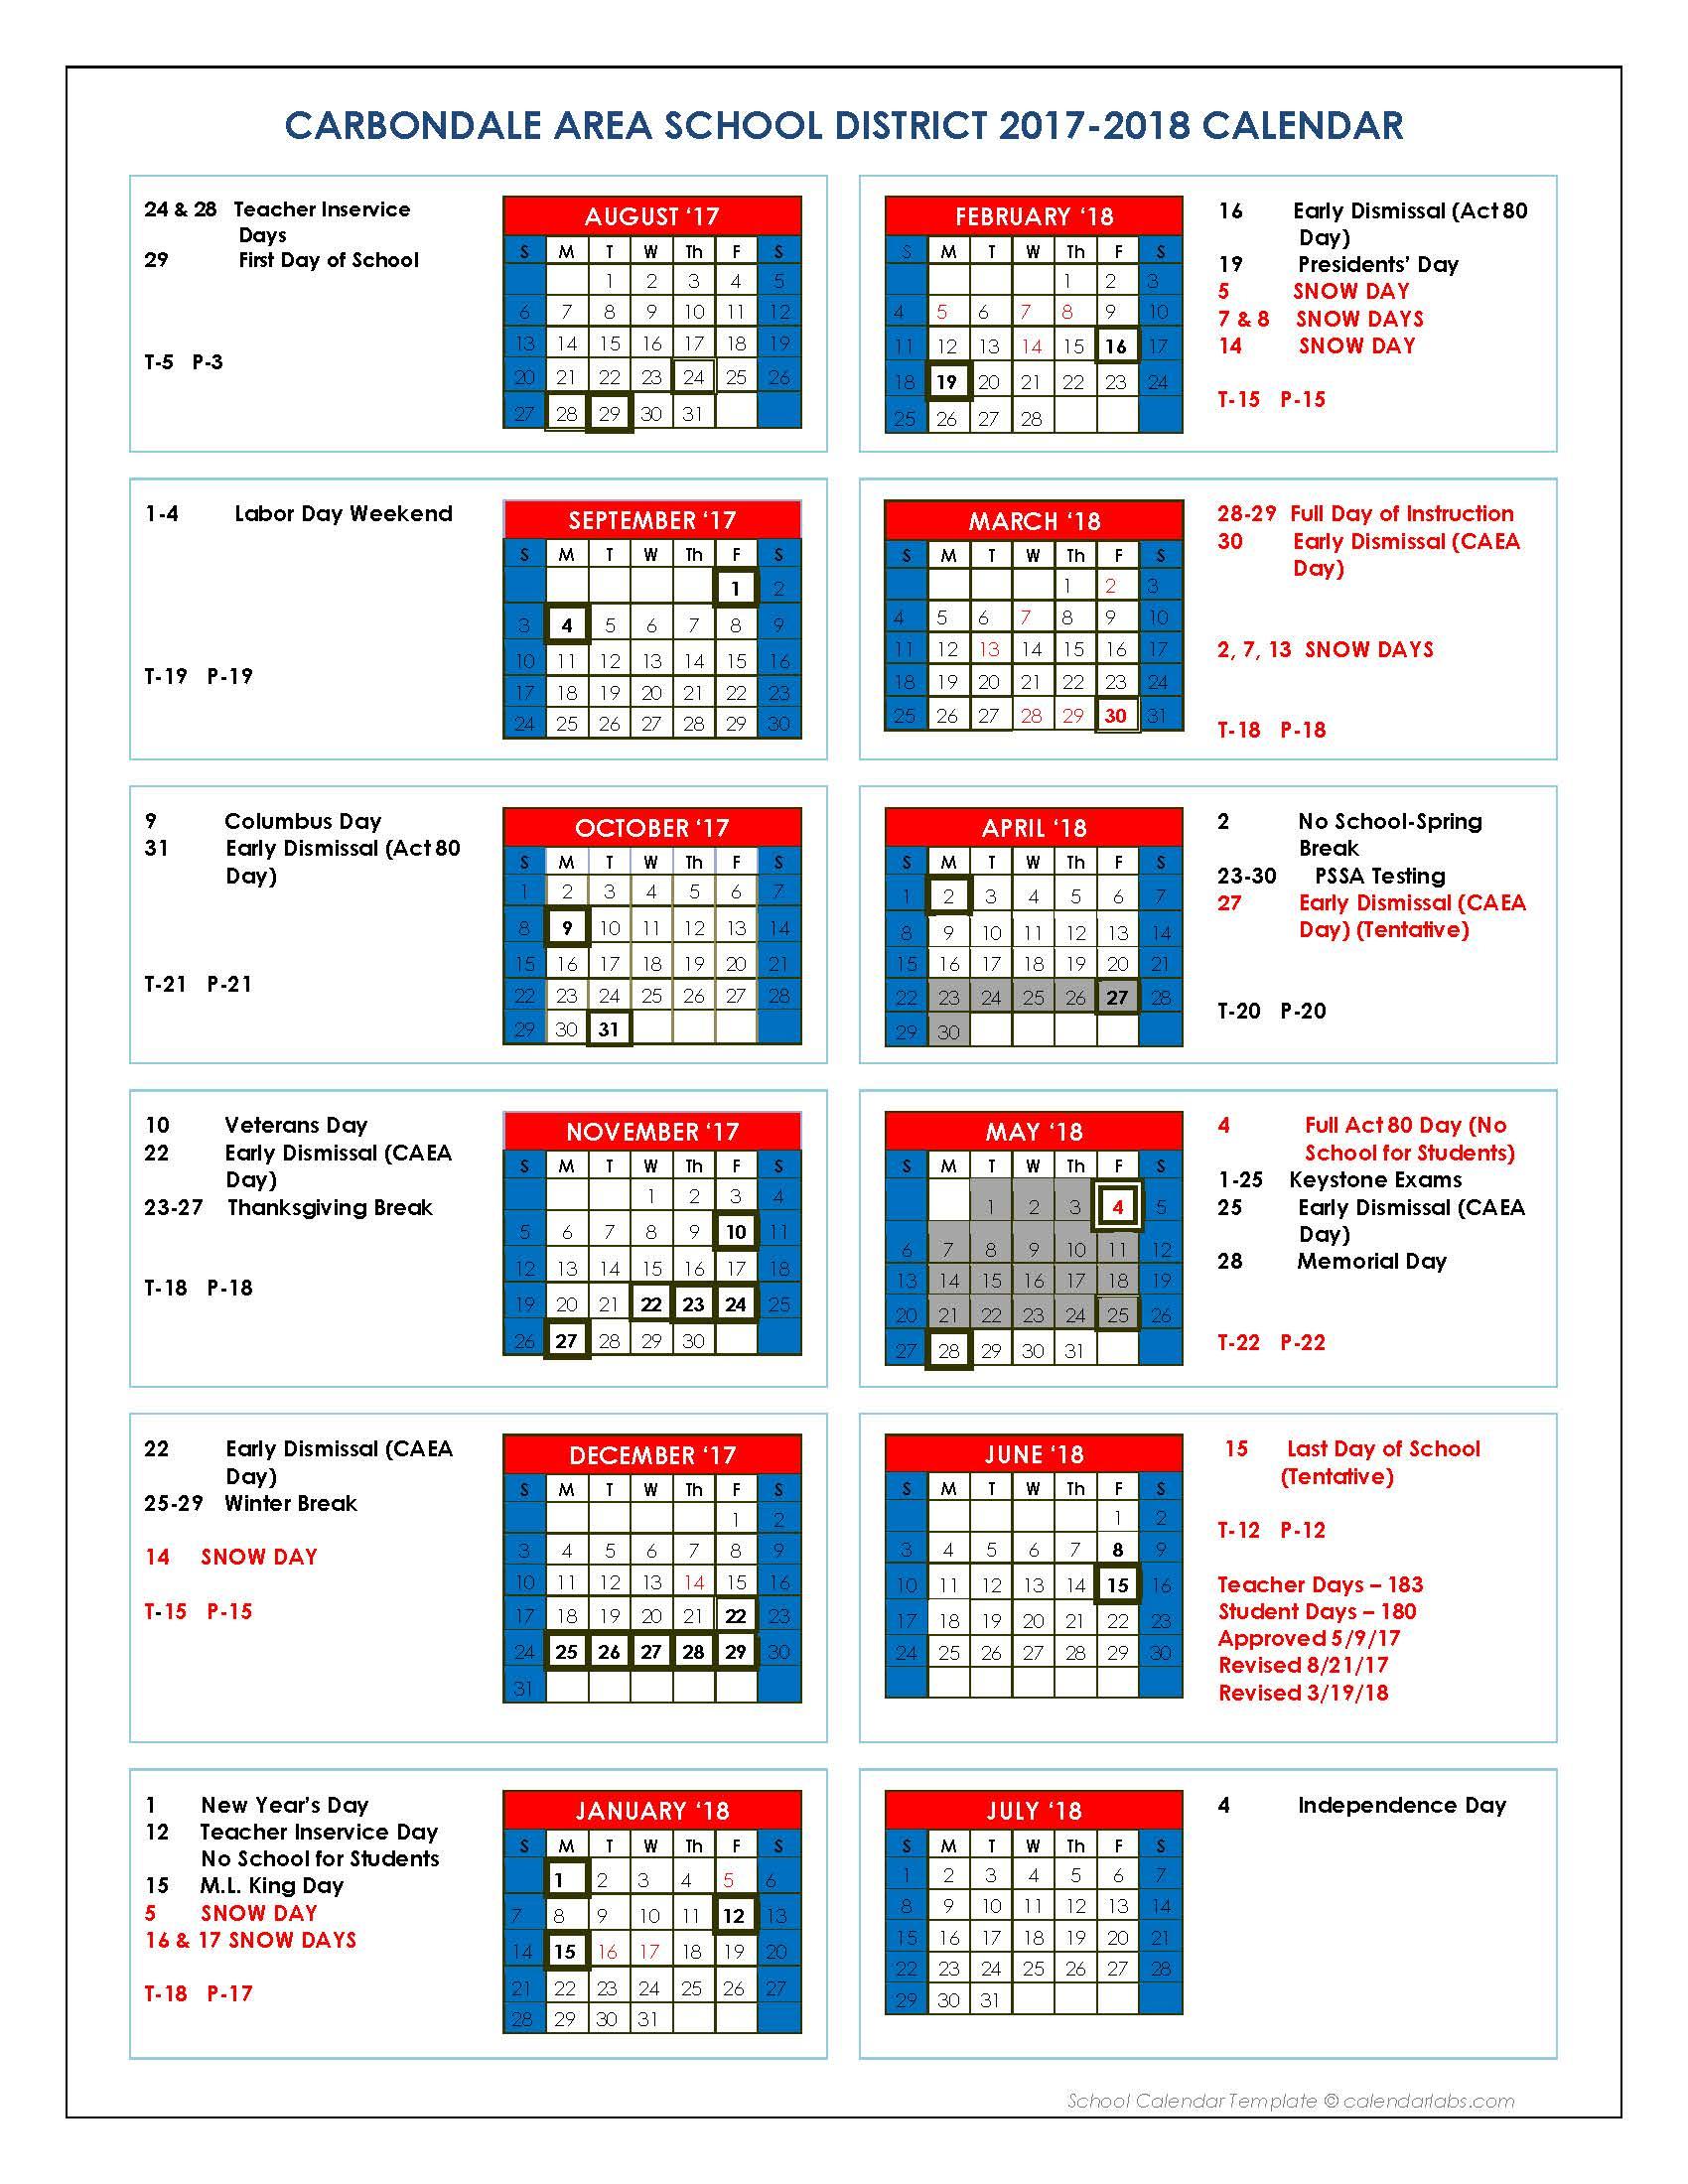 District Calendar Revised | Carbondale Area School District inside Stroudsburg Public School Calendar